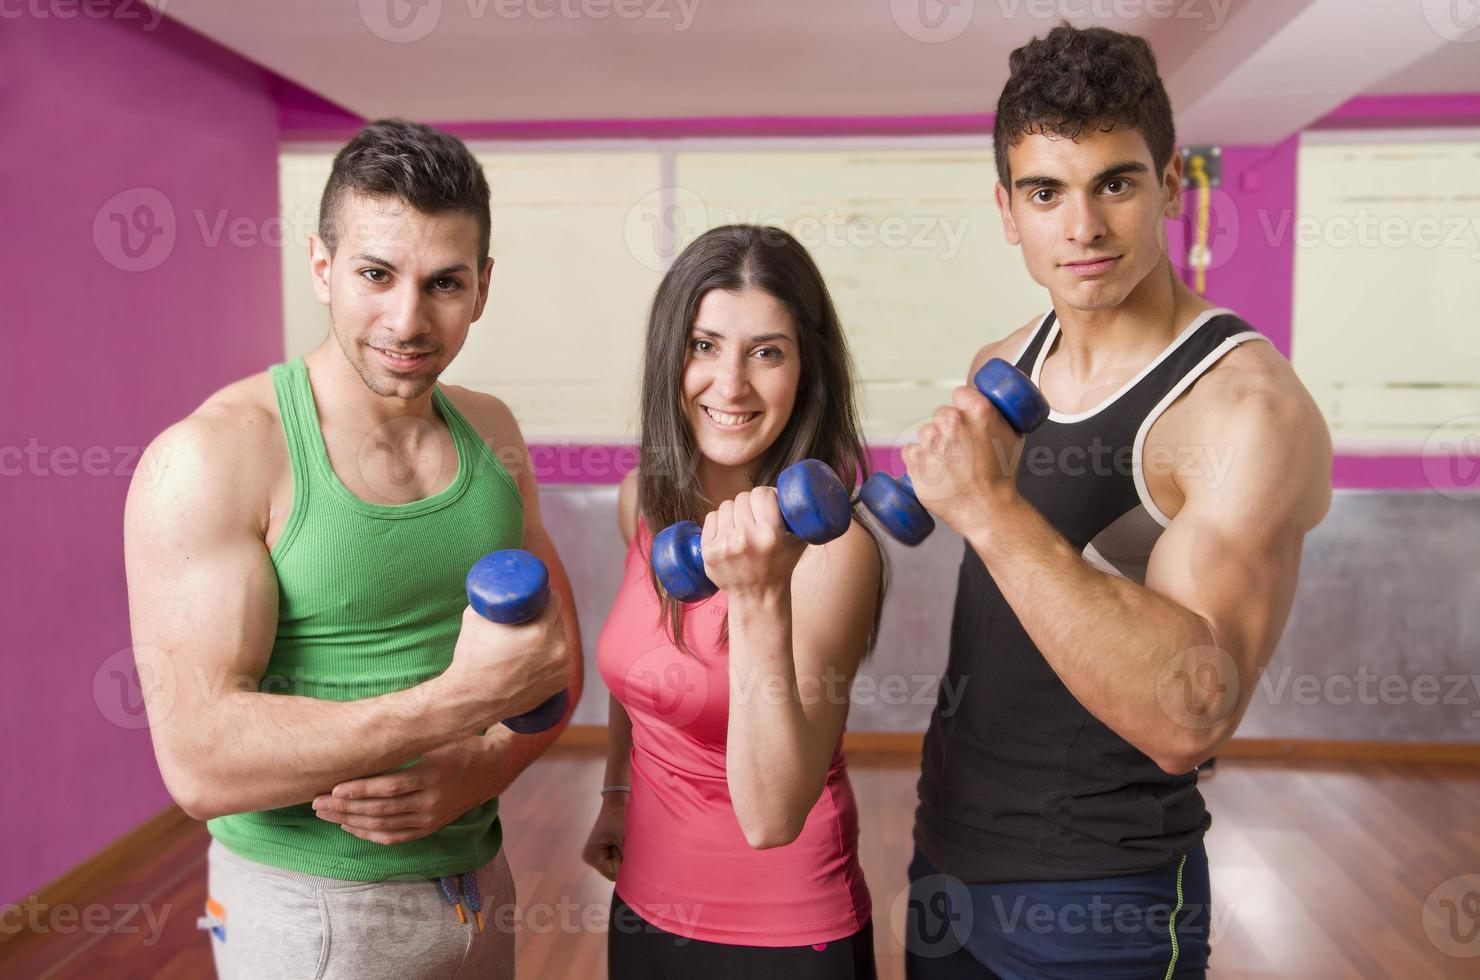 gymmet folk foto